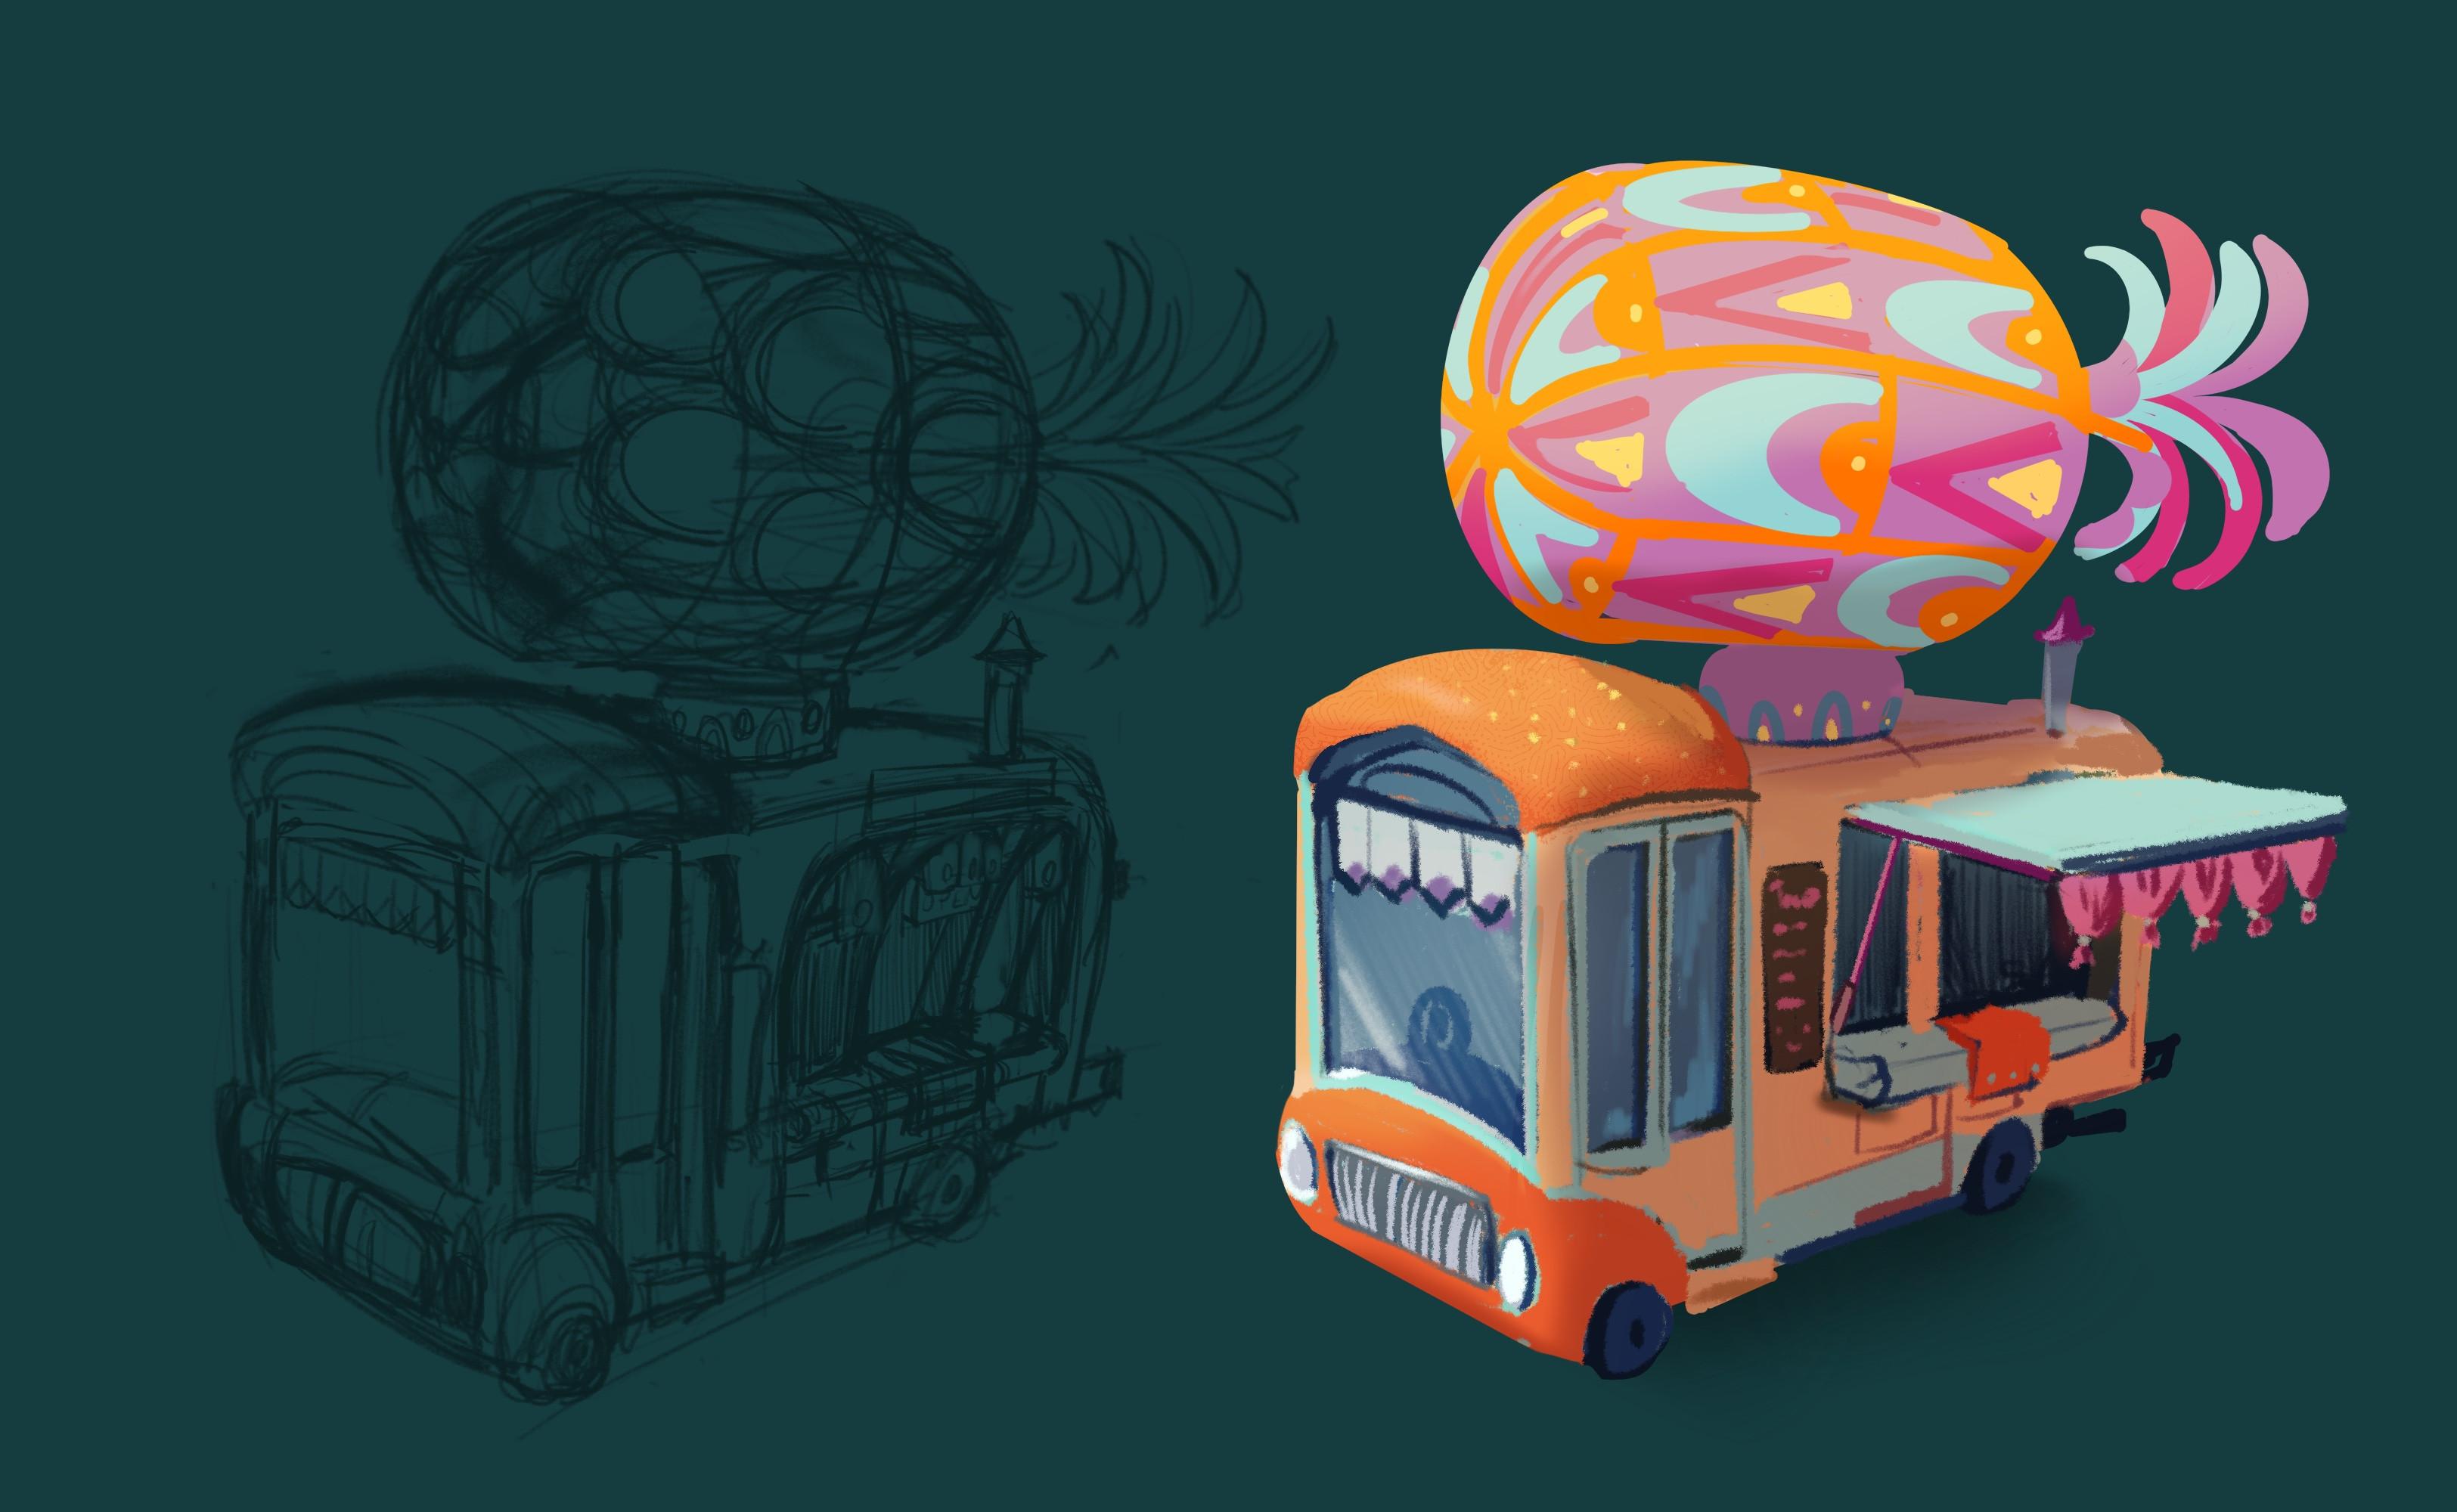 Pineapple buss